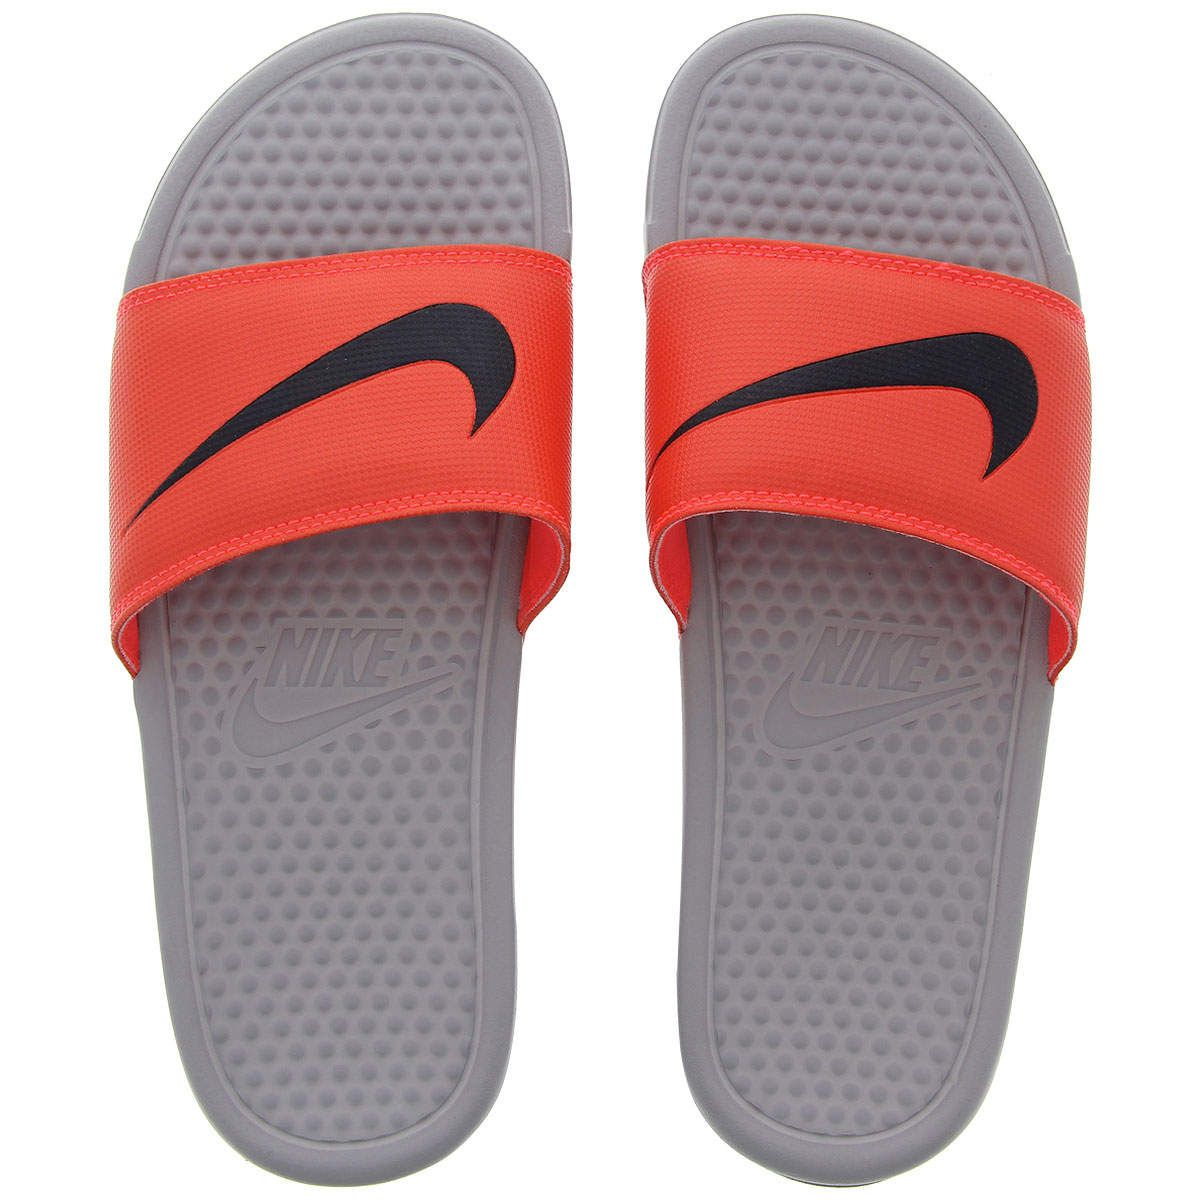 dbcabea11 Chinelo Nike Benassi Swoosh Masculino | INSPIRATIONS em 2019 ...